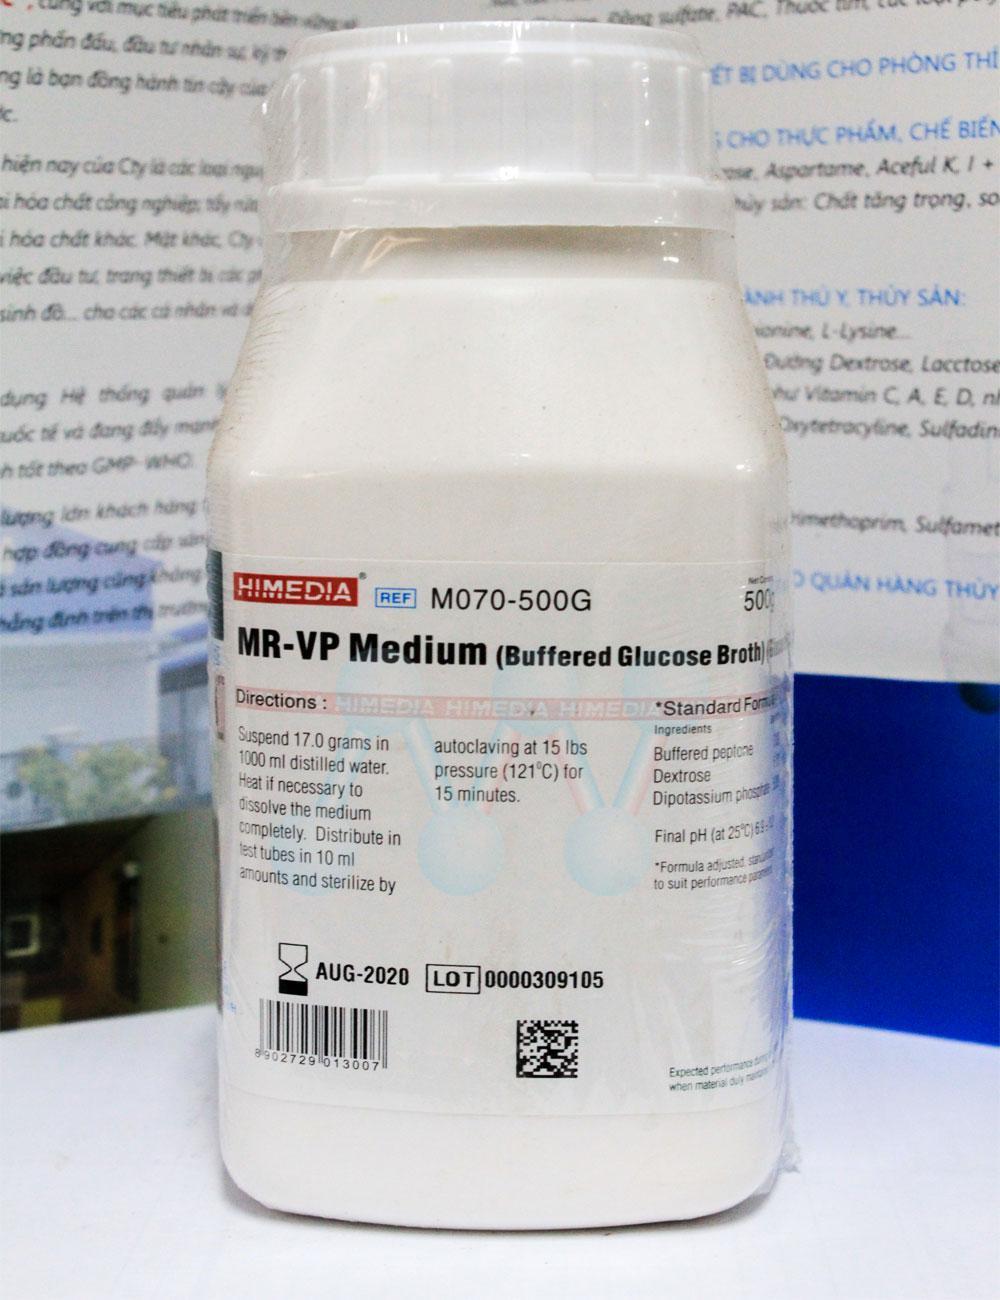 Buffered Glucose Broth (Glucose Phosphate Broth)